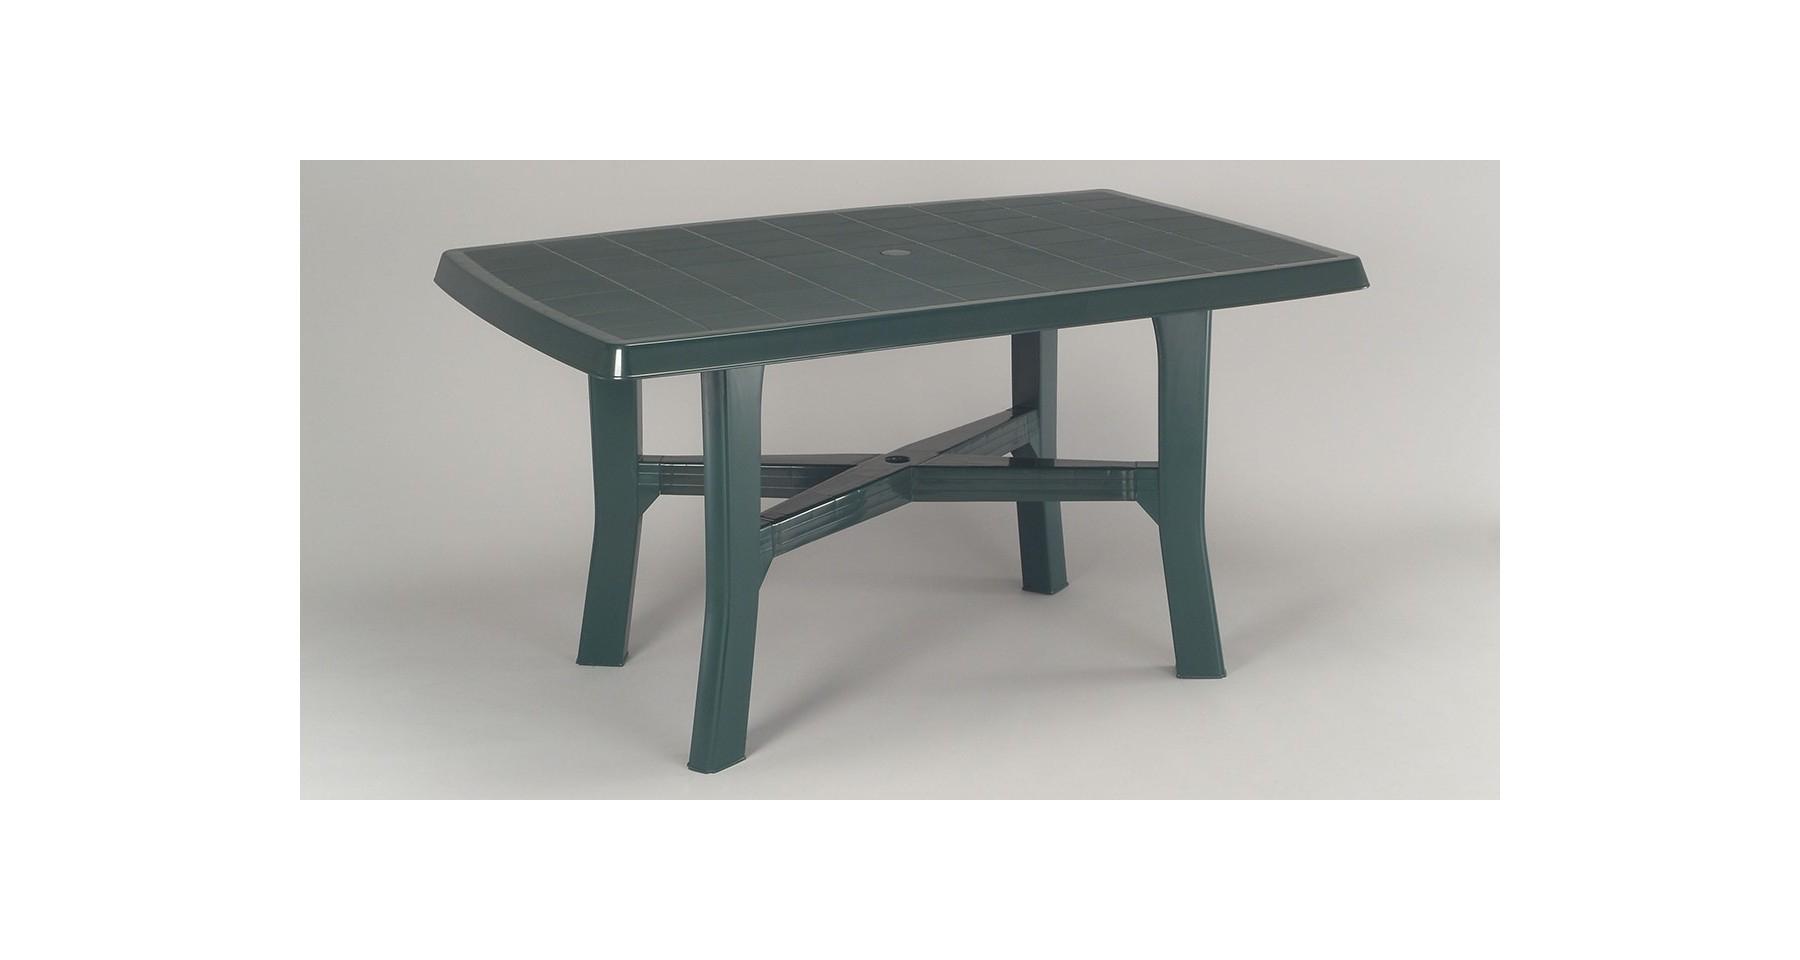 Table De Jardin En Rã©Sine Table De Jardin Verte En Résine ... avec Table Jardin Verte